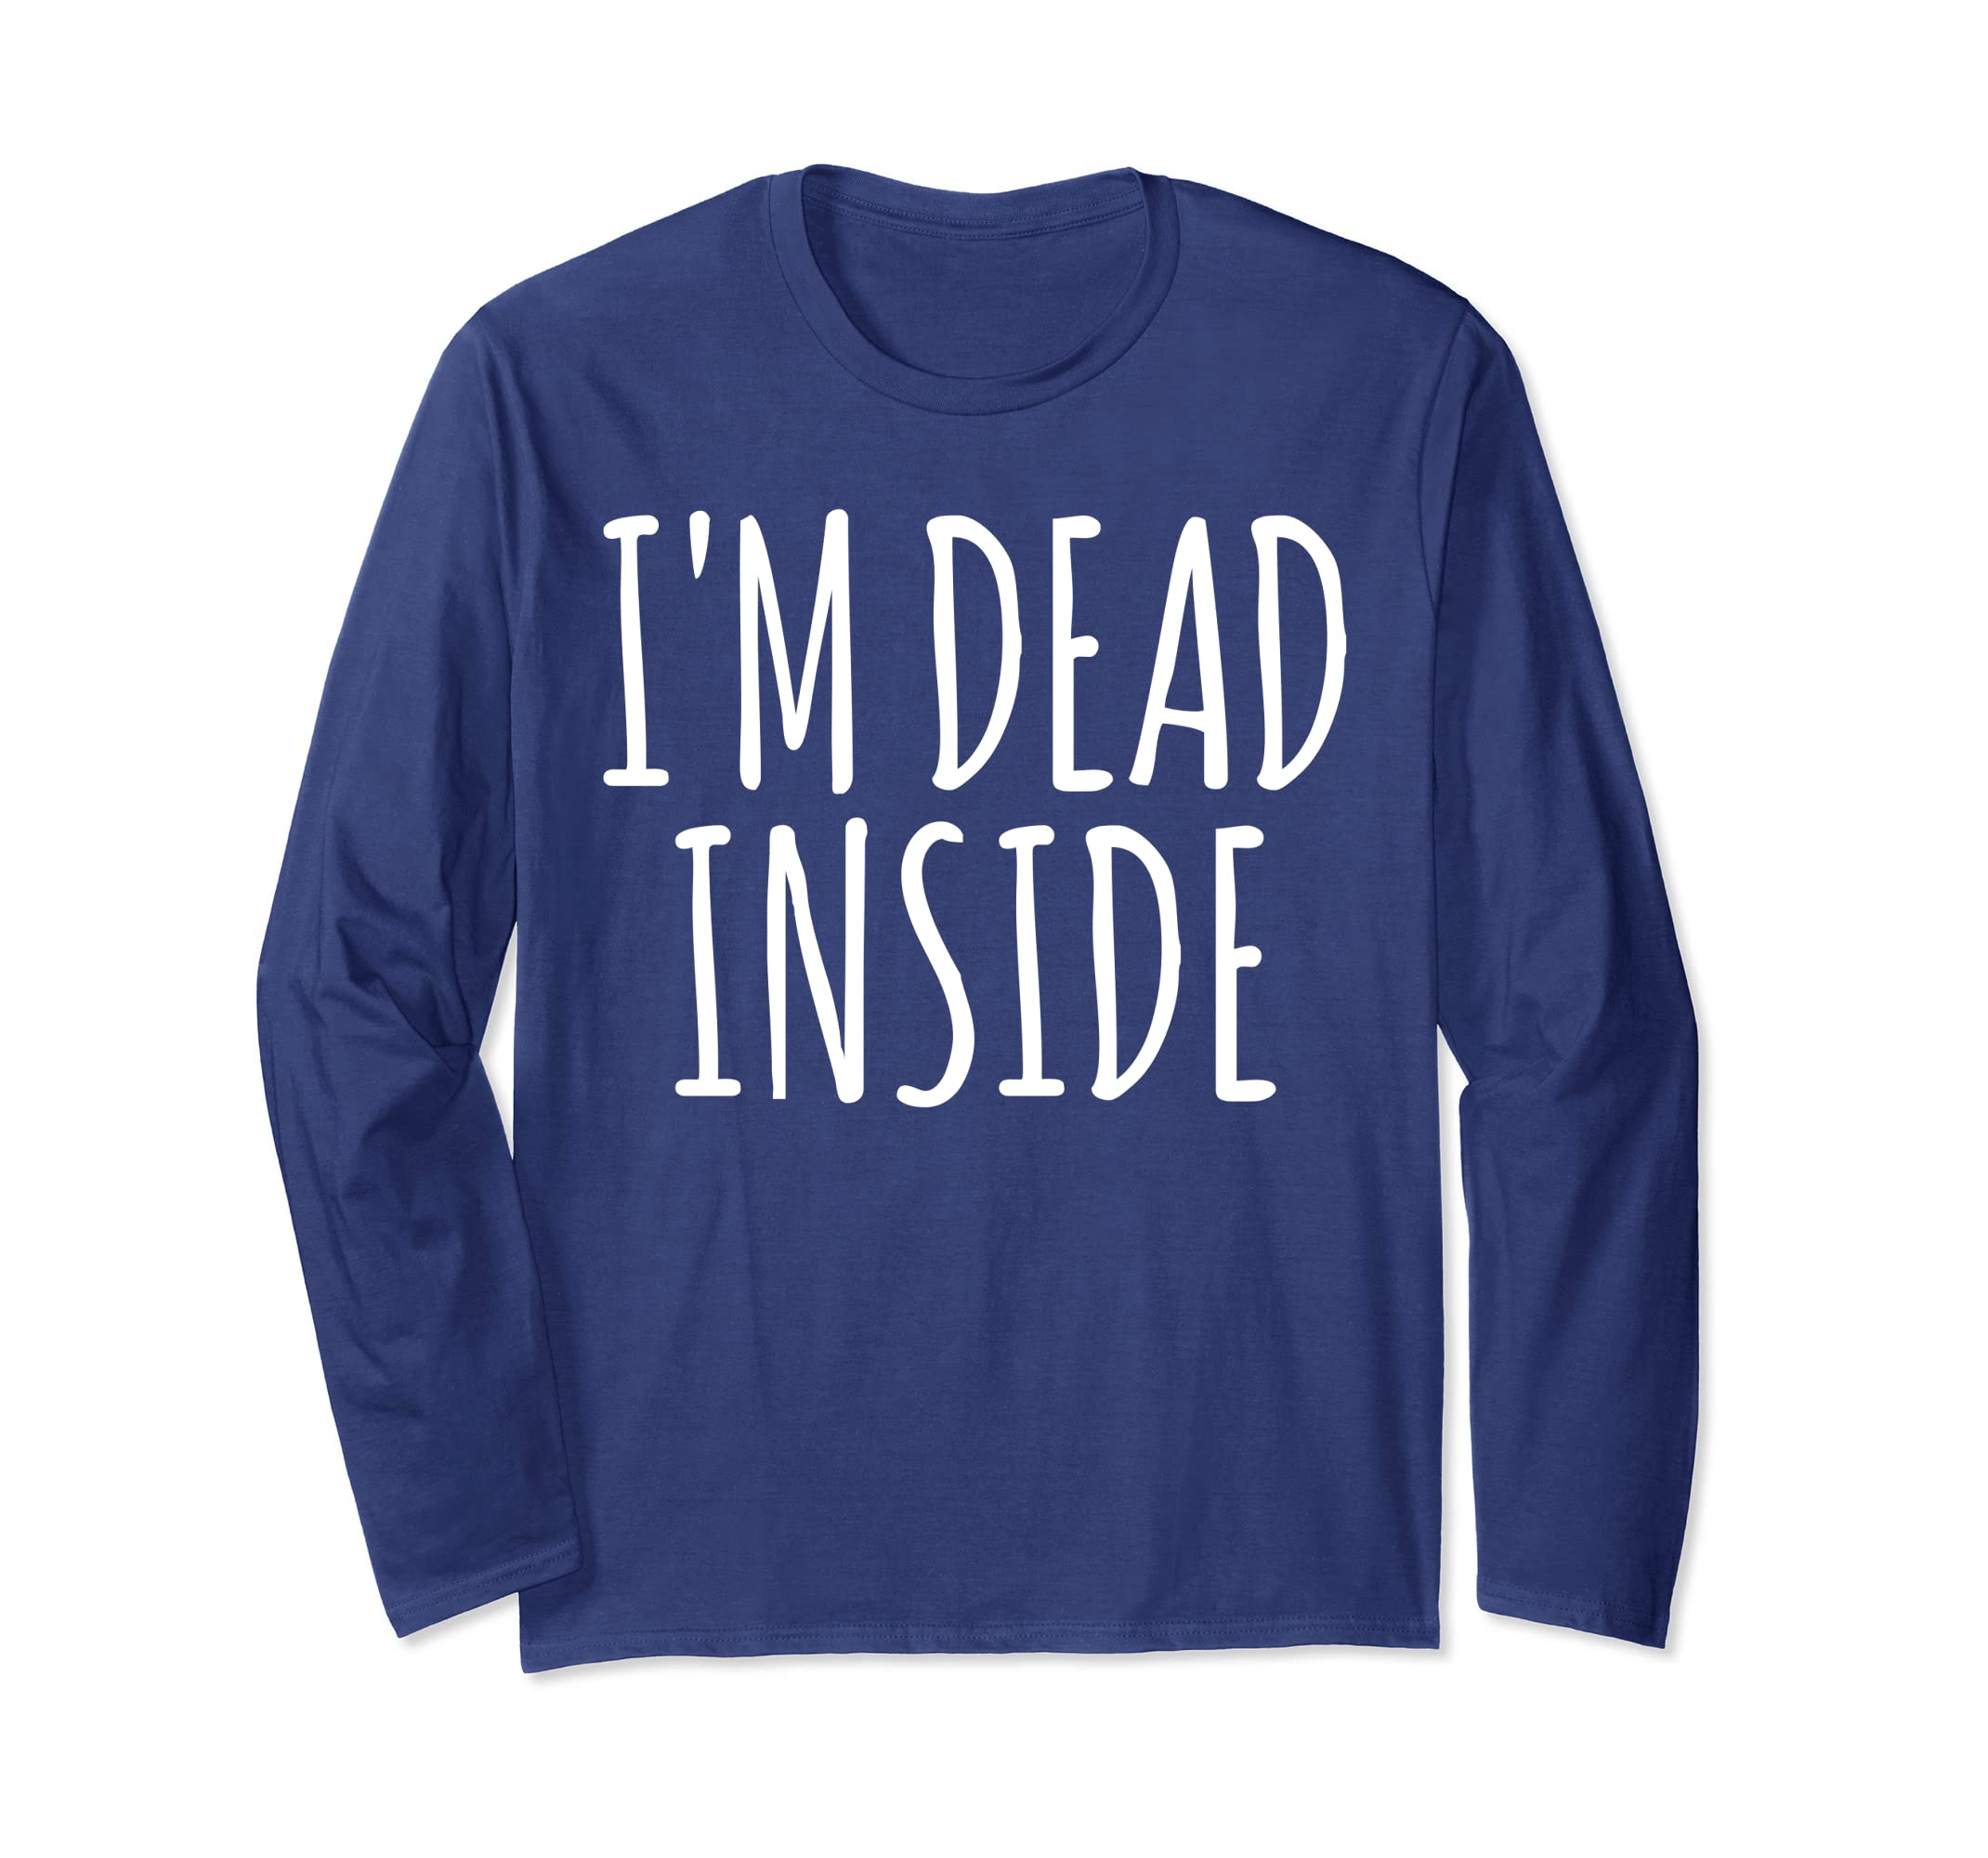 Lazy Funny Halloween Costume Shirt I'M DEAD INSIDE Gift-mt